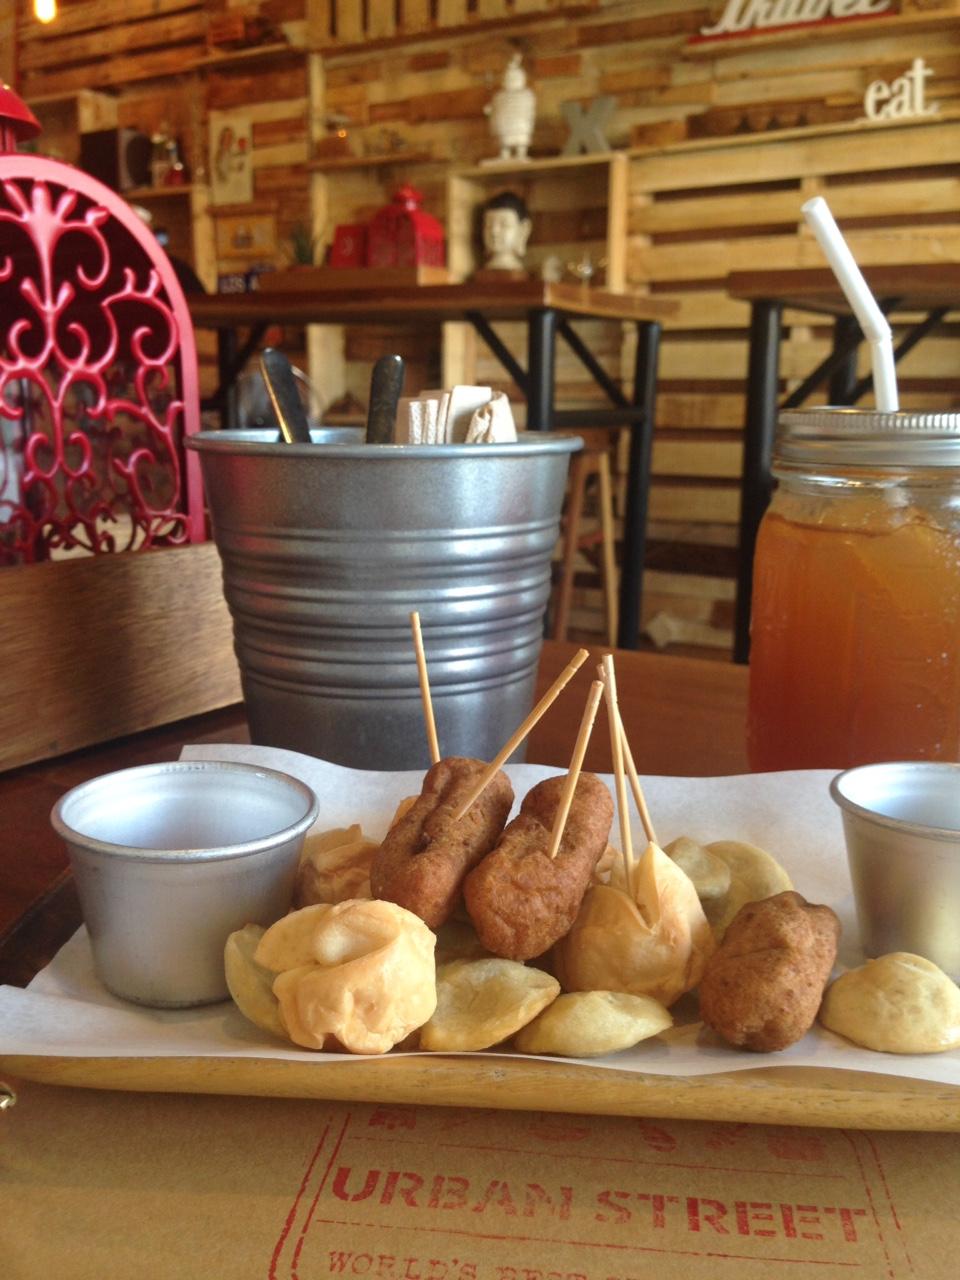 I think this is called Manila Tusok-tusok or something like that :) It's an assortment of fishballs, squid balls, and kikiam